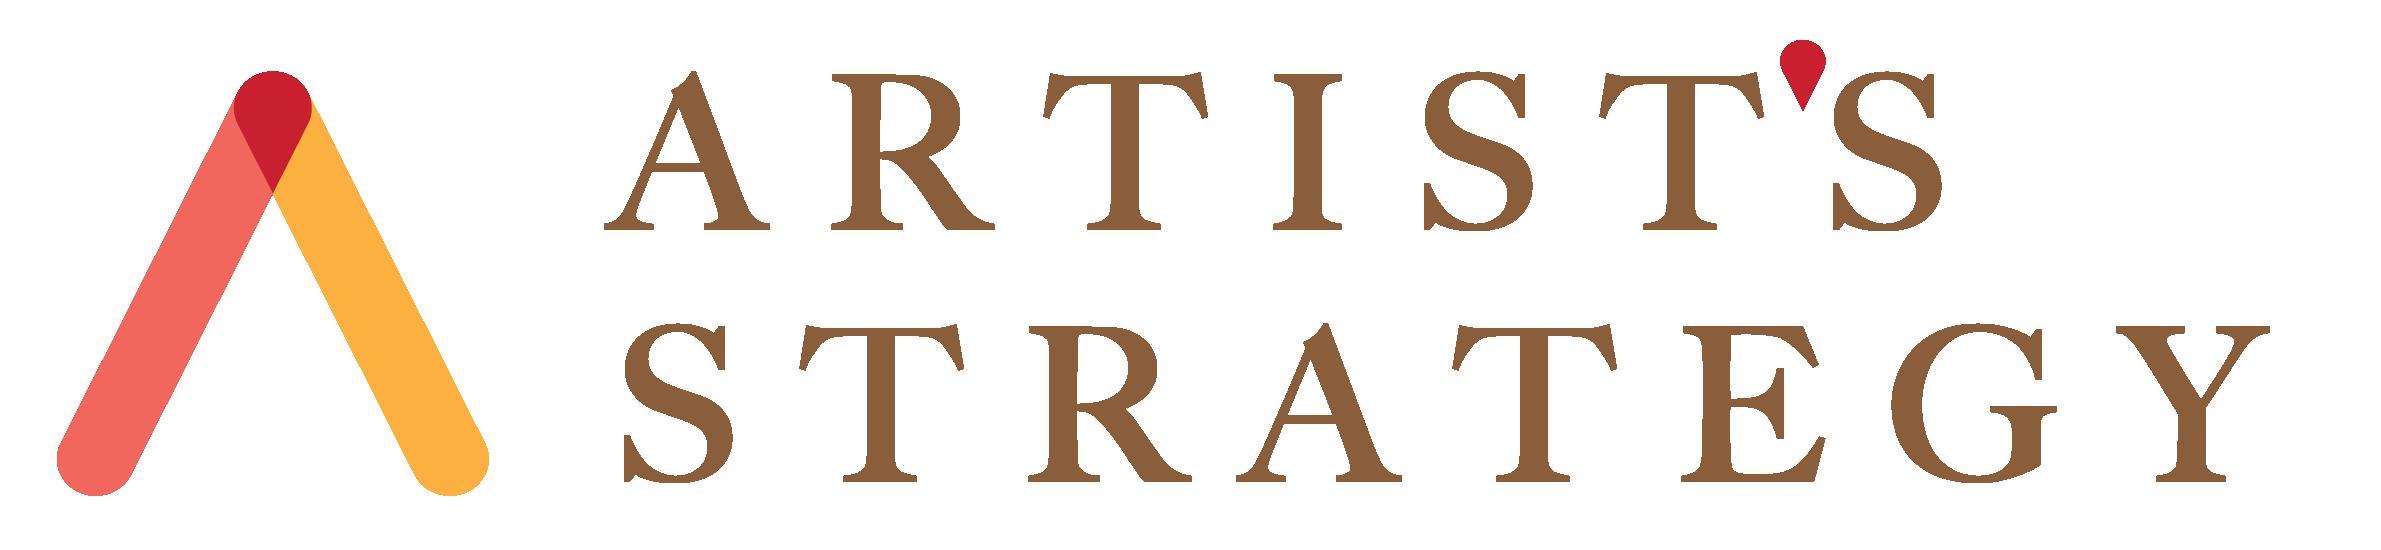 artiststrategy-full-left-2.png